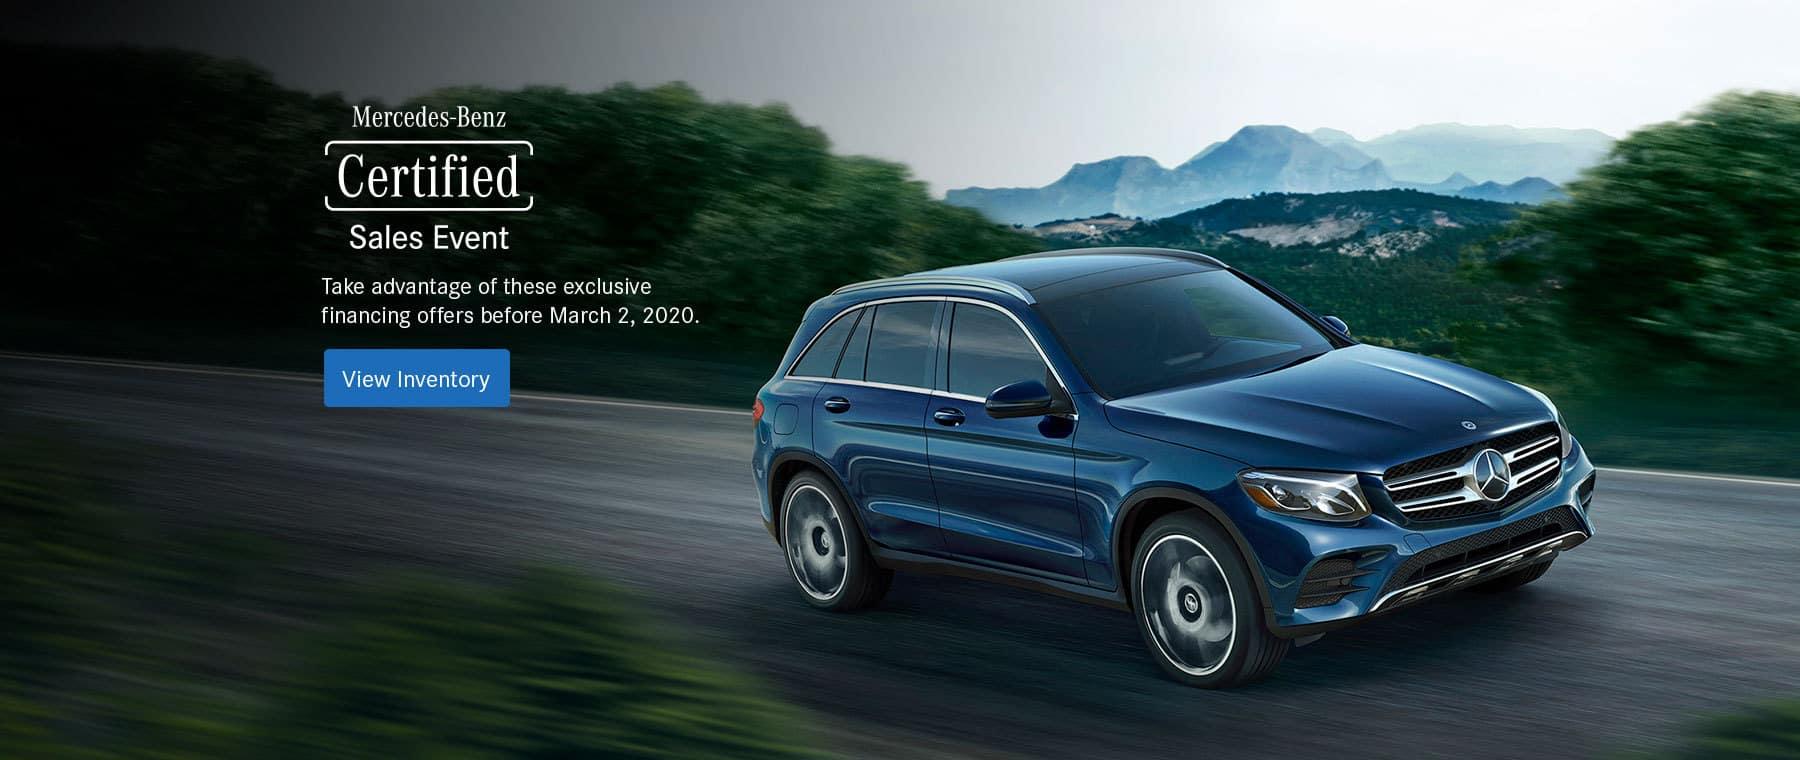 Mercedes Of Warwick >> New Used Luxury Auto Dealership In Warwick Mercedes Benz